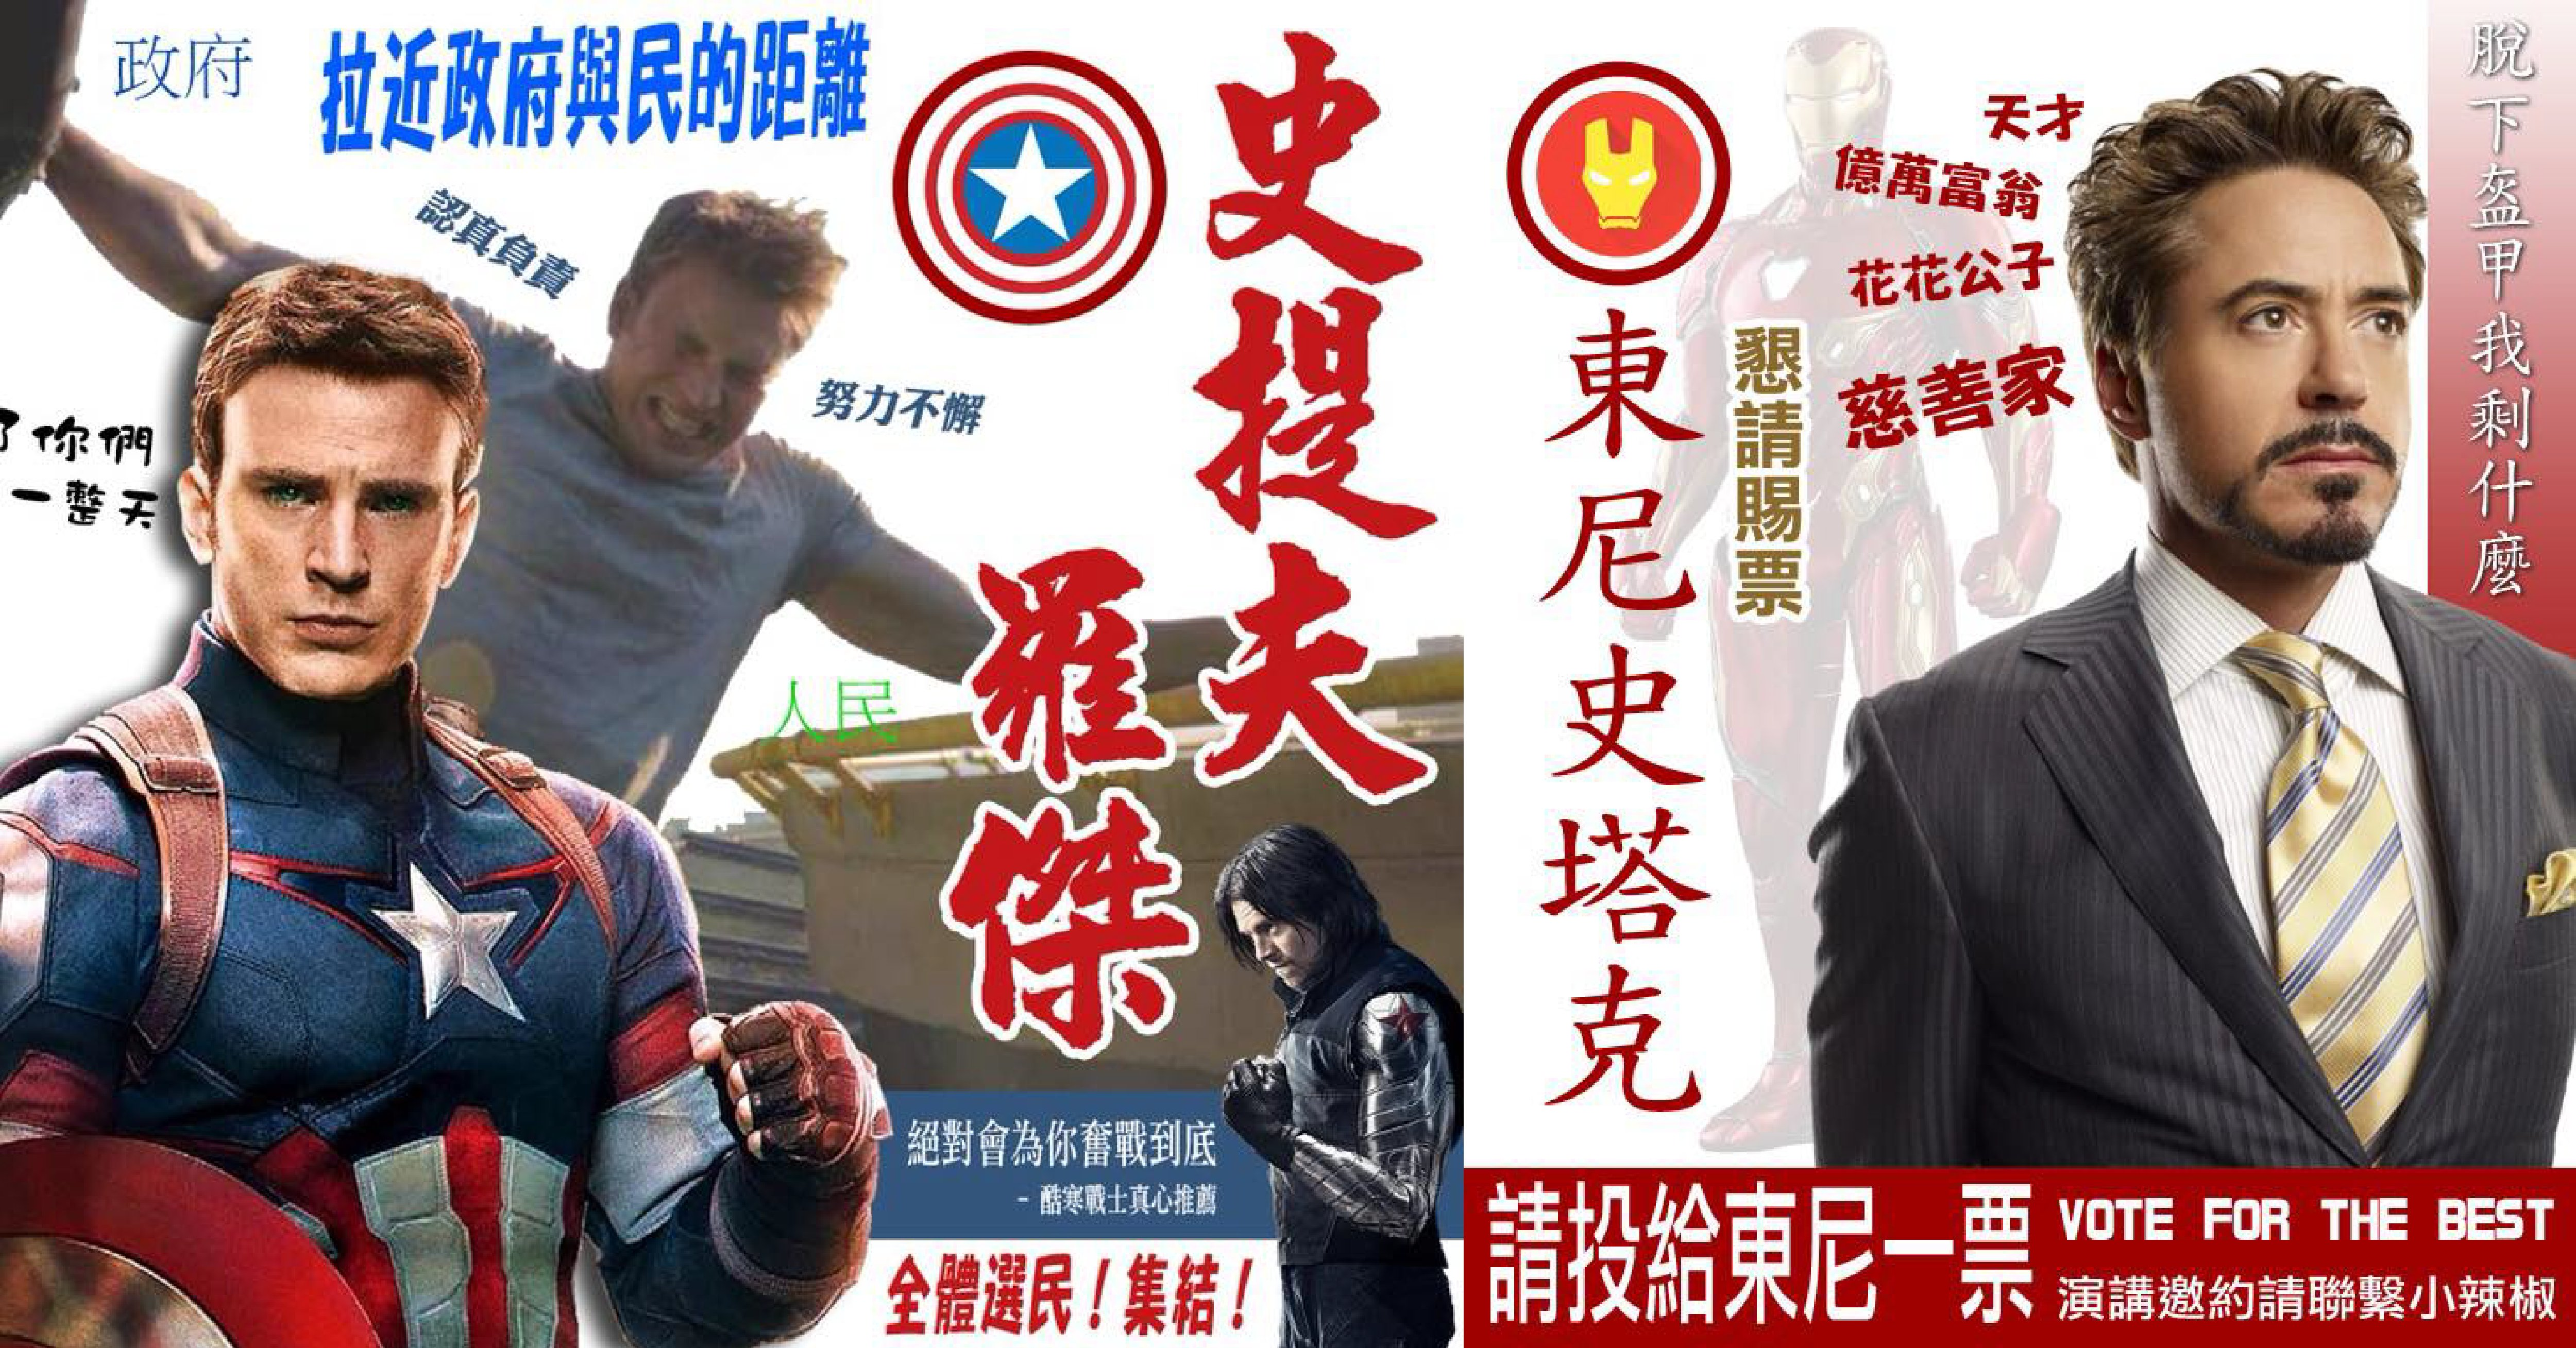 e69caae591bde5908d 2 01.png?resize=300,169 - 復仇者聯盟來台灣選議員了?漫威英雄這系列競選海報中肯到你笑出來